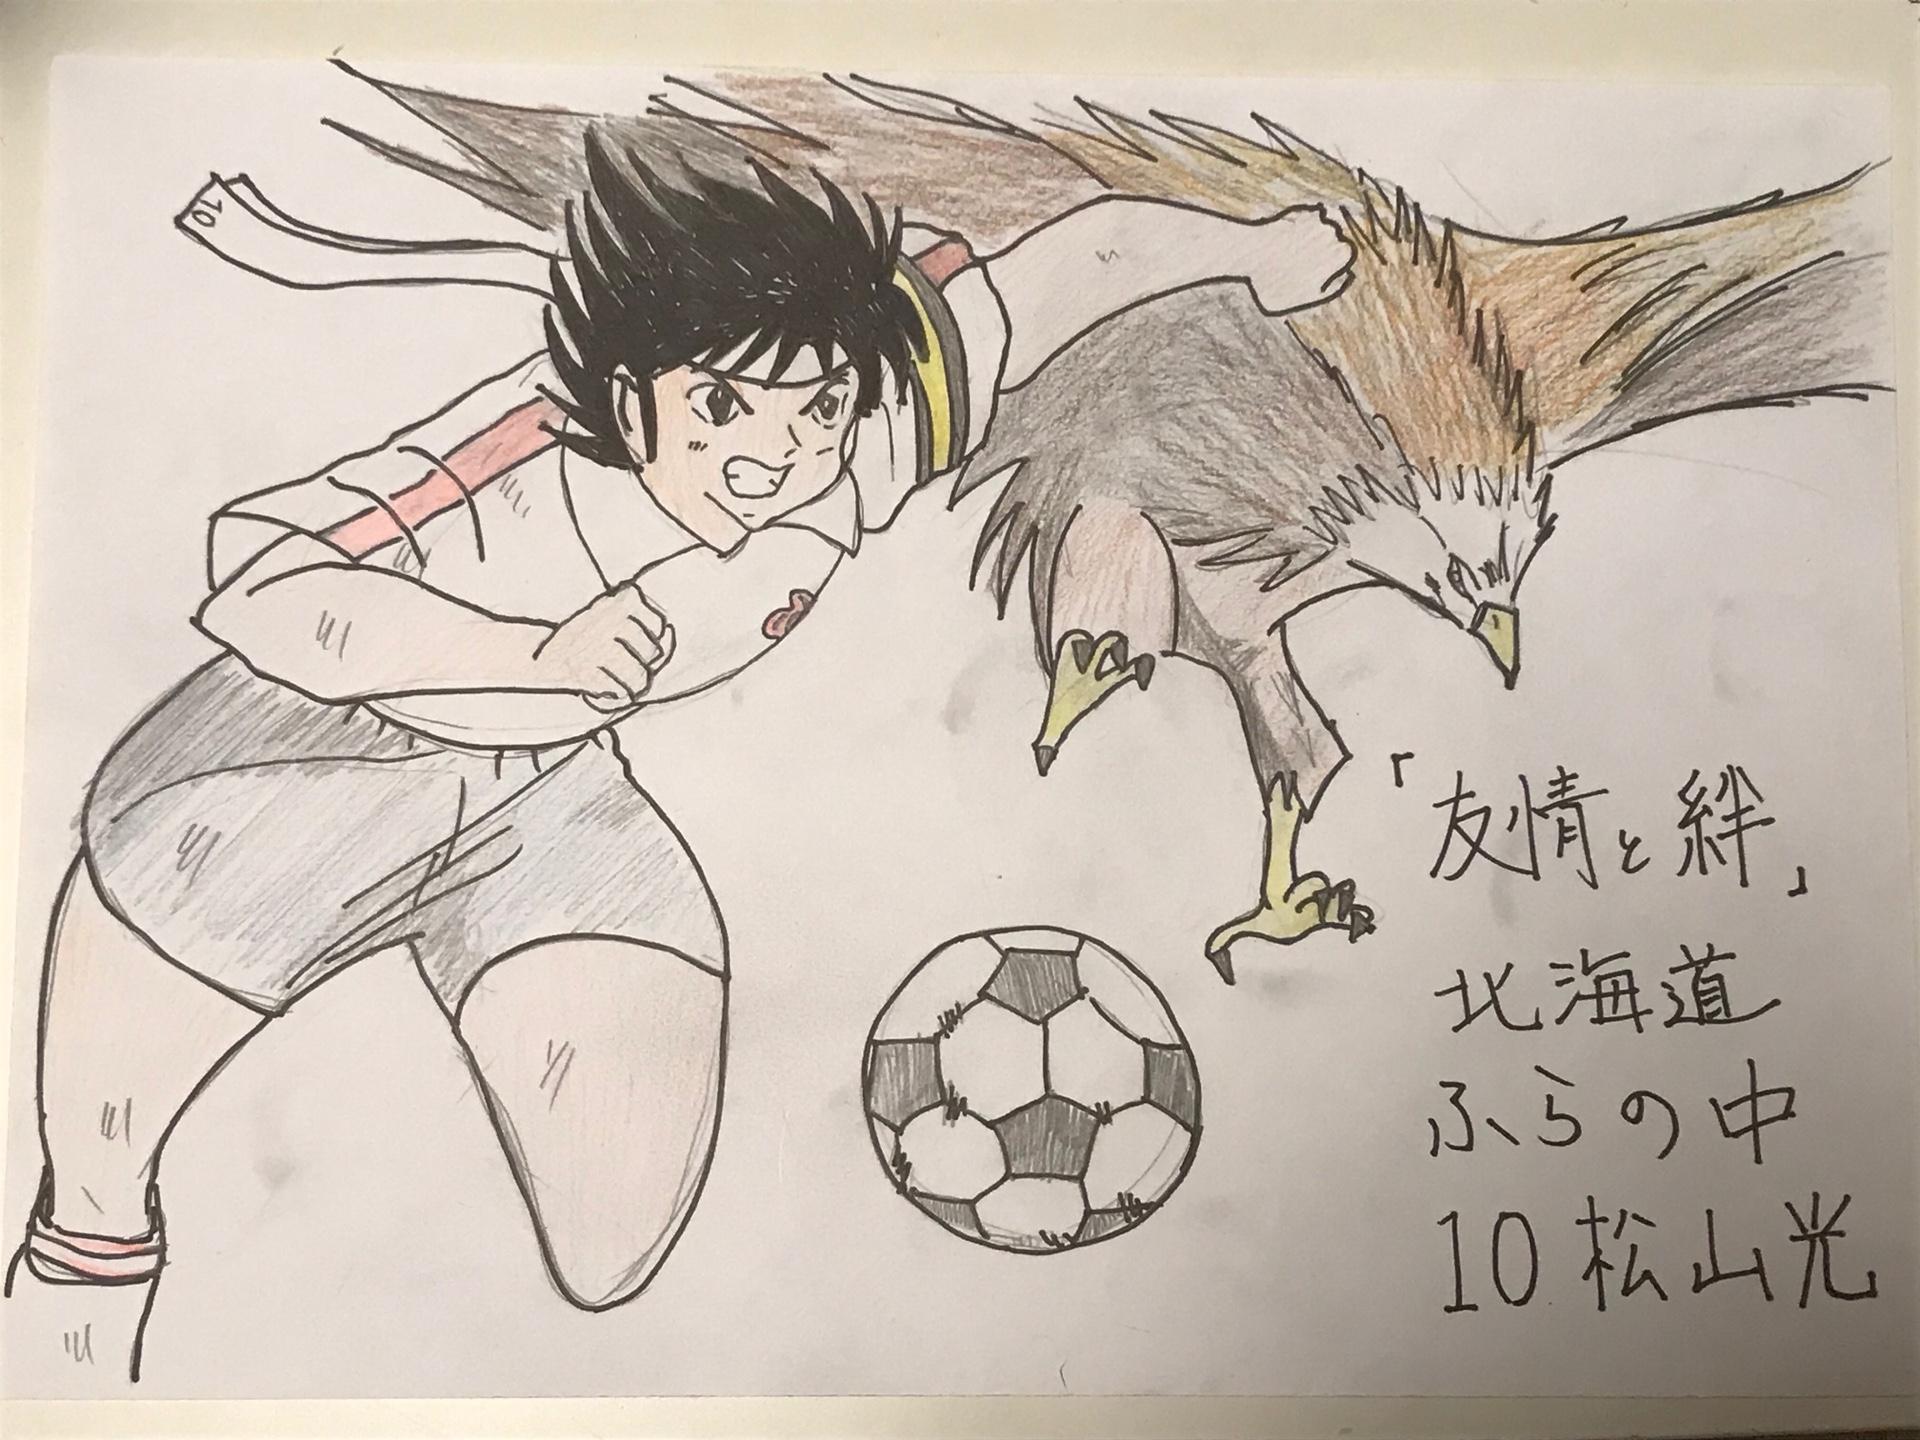 Tvアニメキャプテン翼イラストコンテスト イラスト部門